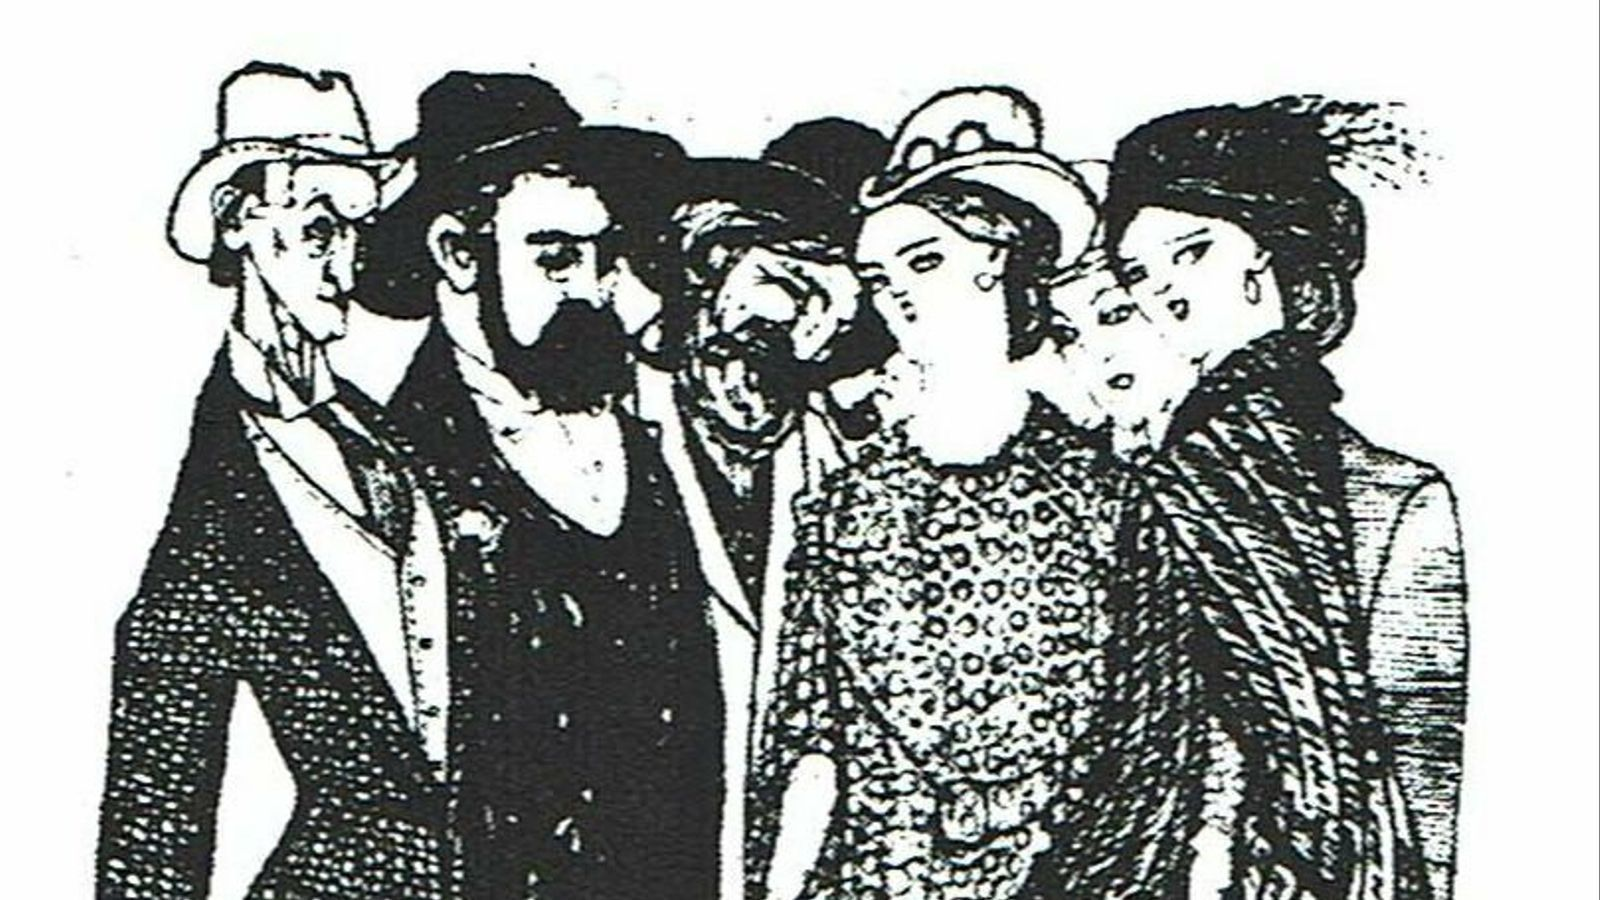 Tasca de Quaresma: Divendres Sant (1908)